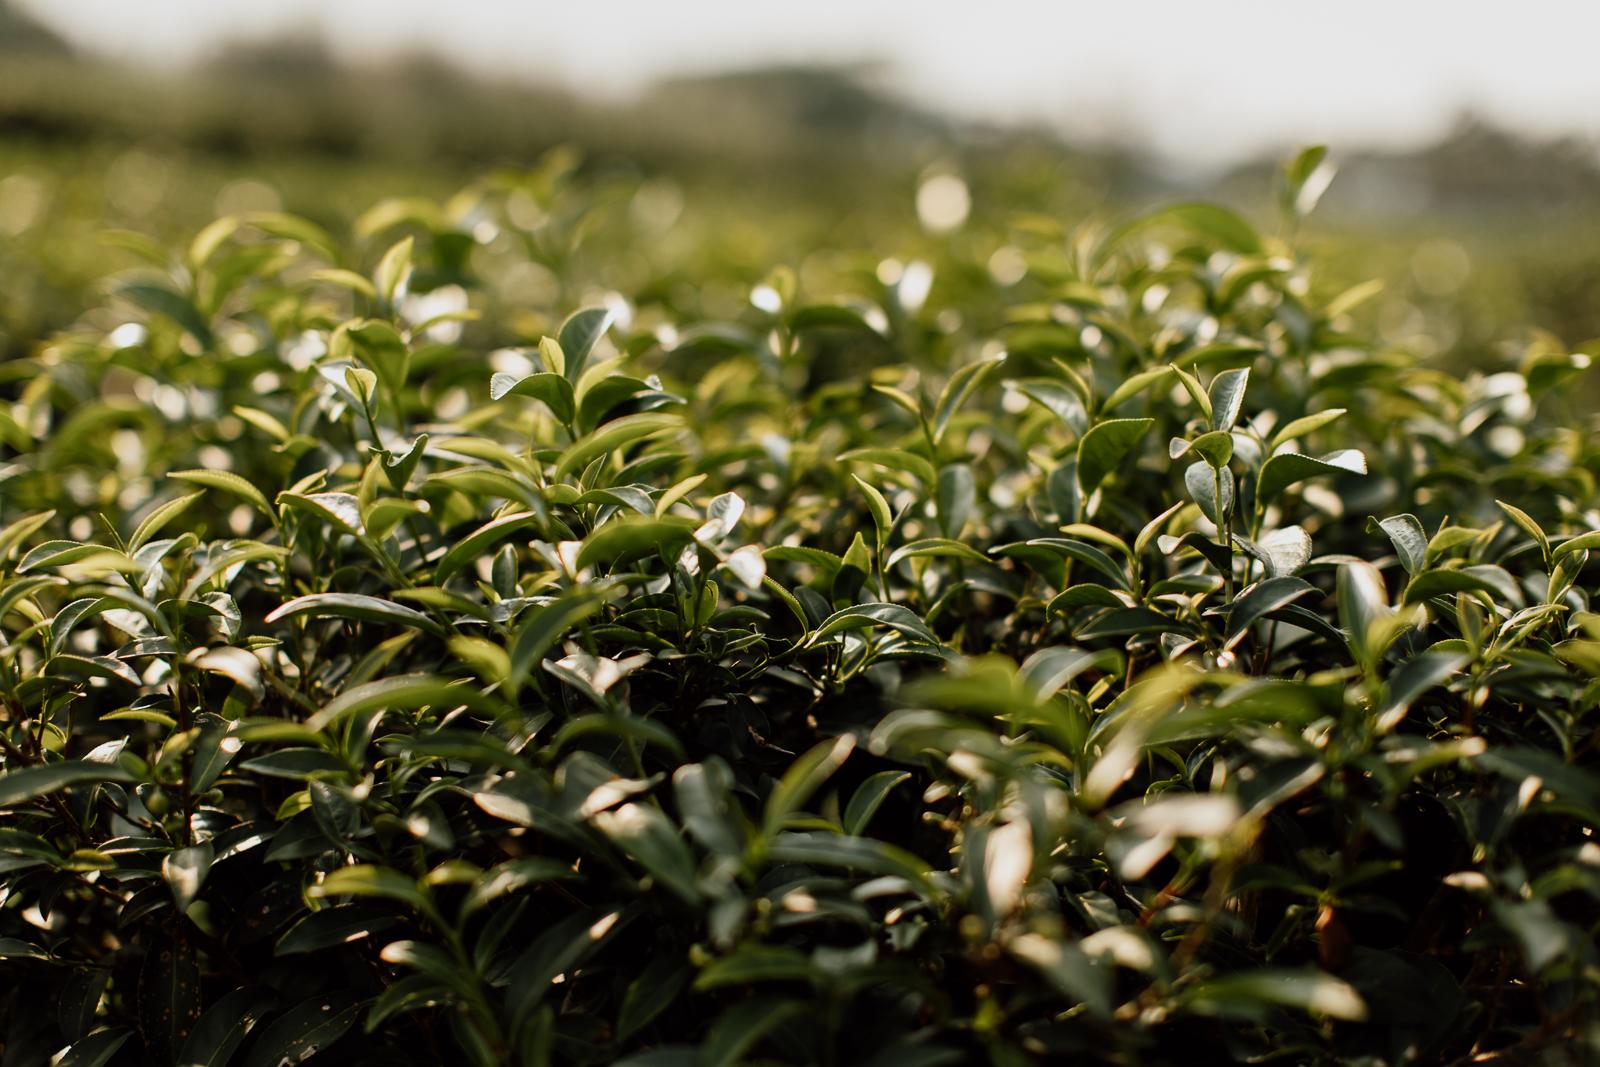 Tea Plants Glowing Under the Sun